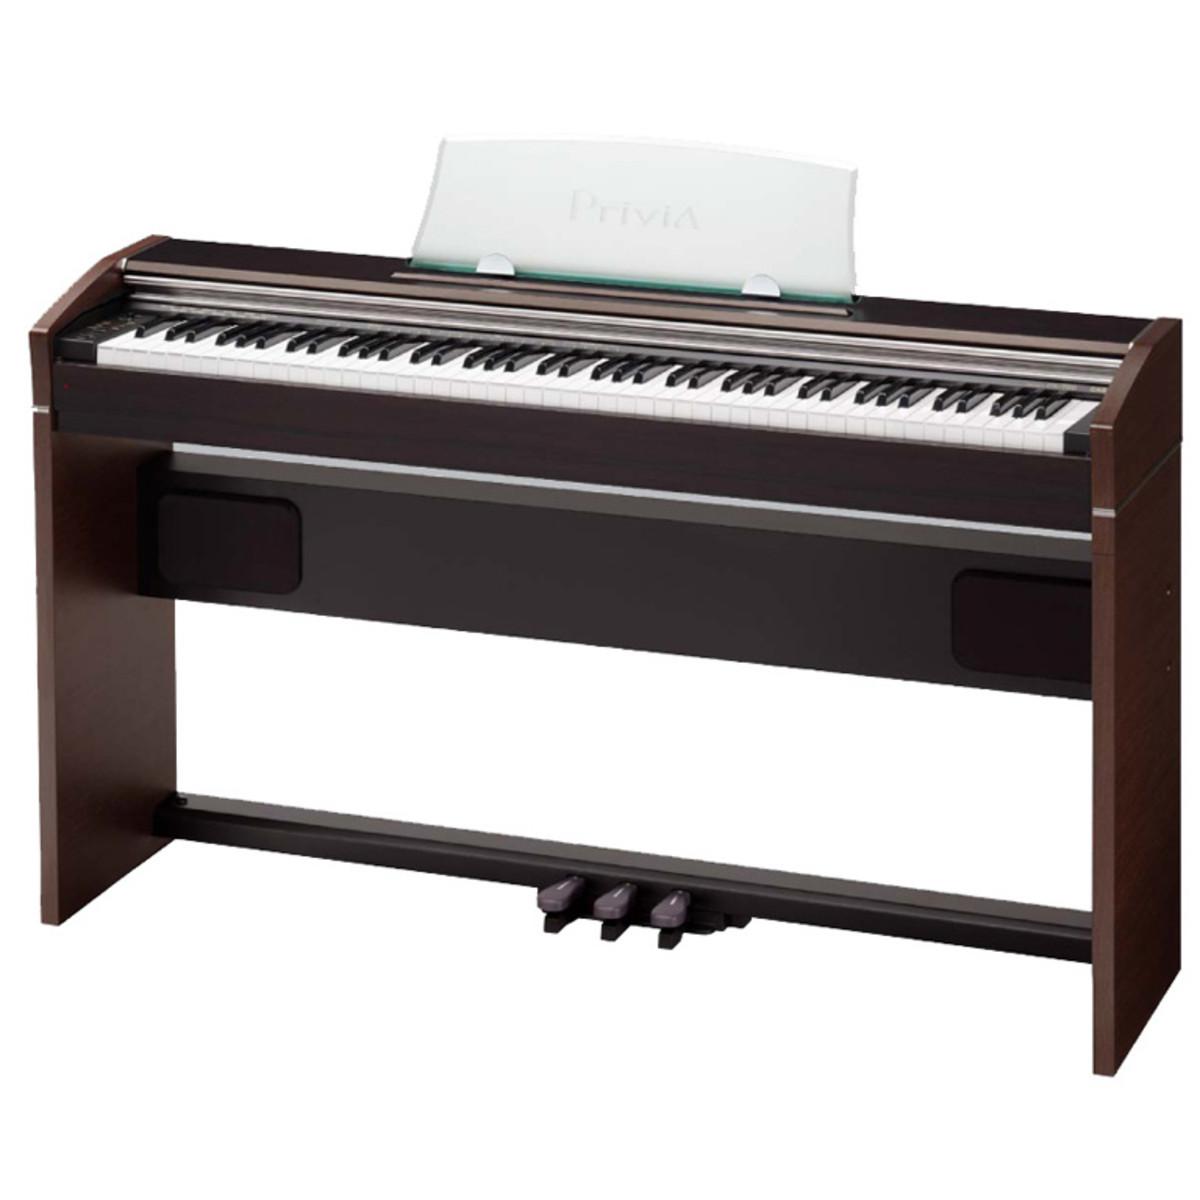 disc casio privia px 700 digital piano at gear4music. Black Bedroom Furniture Sets. Home Design Ideas